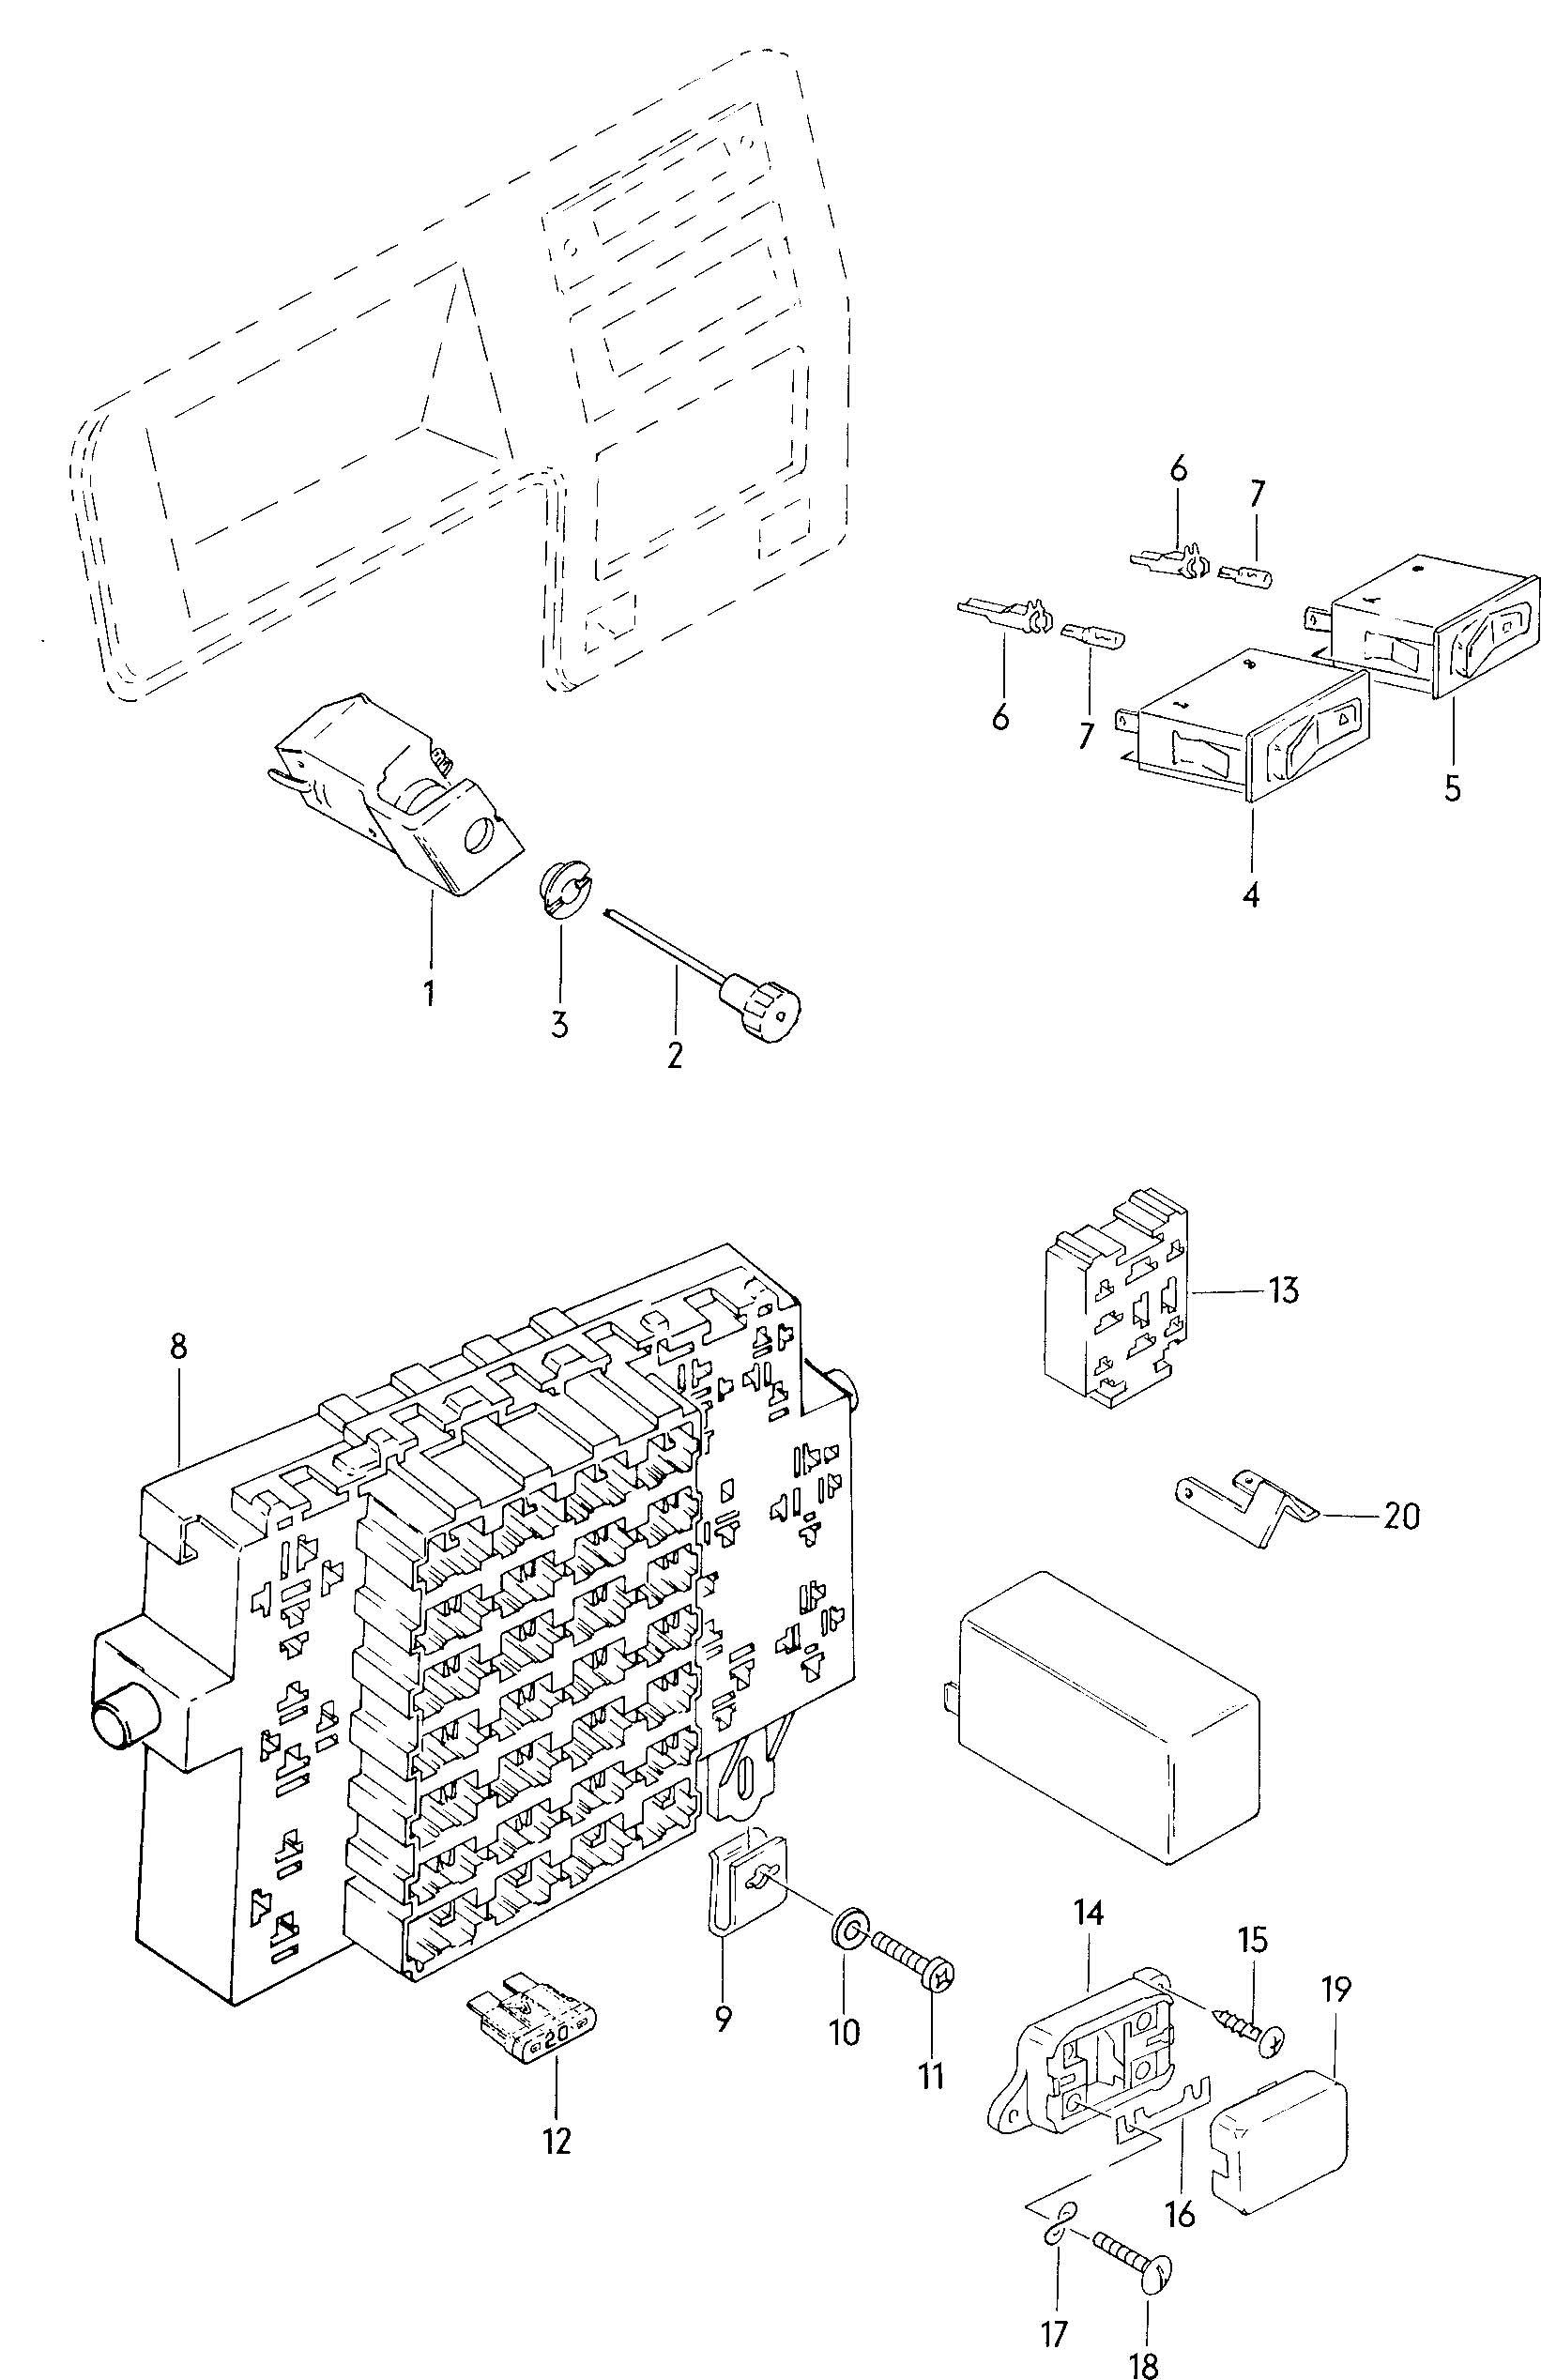 1981 Volkswagen Rabbit Fuse Box. Volkswagen. Auto Wiring